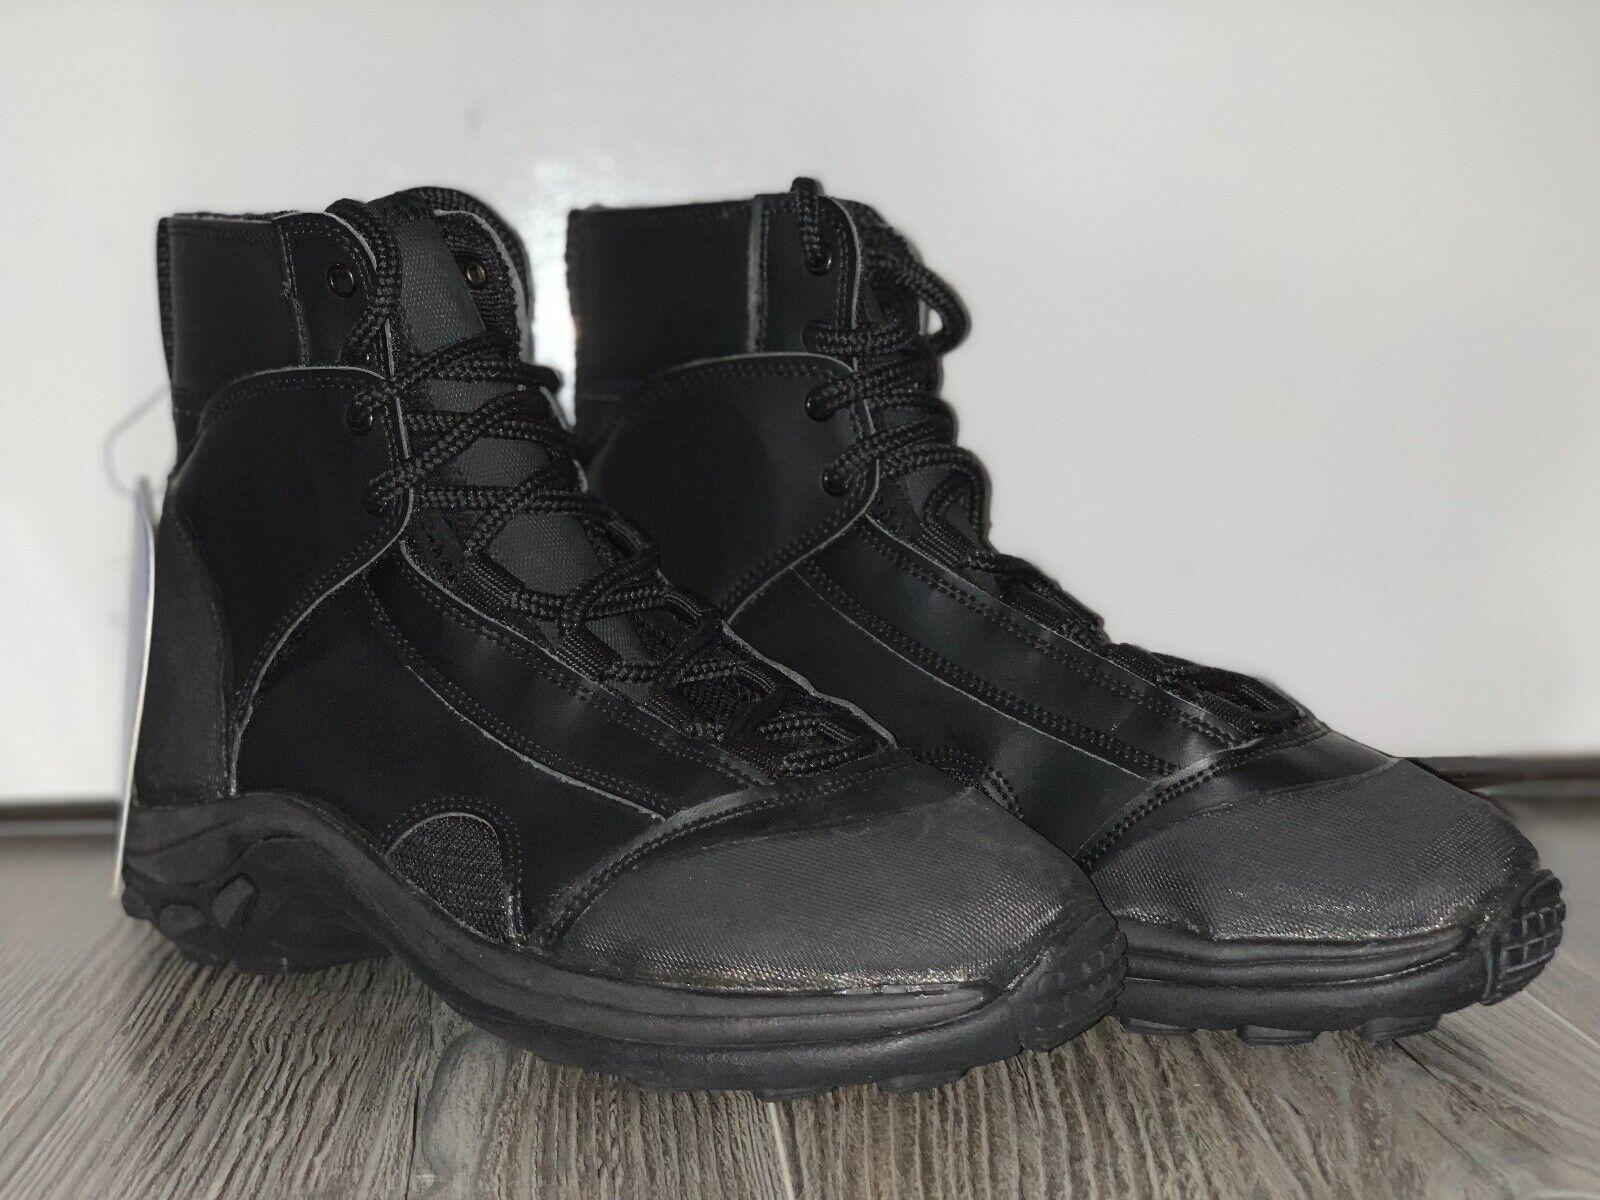 Aqualung Stiefel EVO III (Größe 44)   NEU